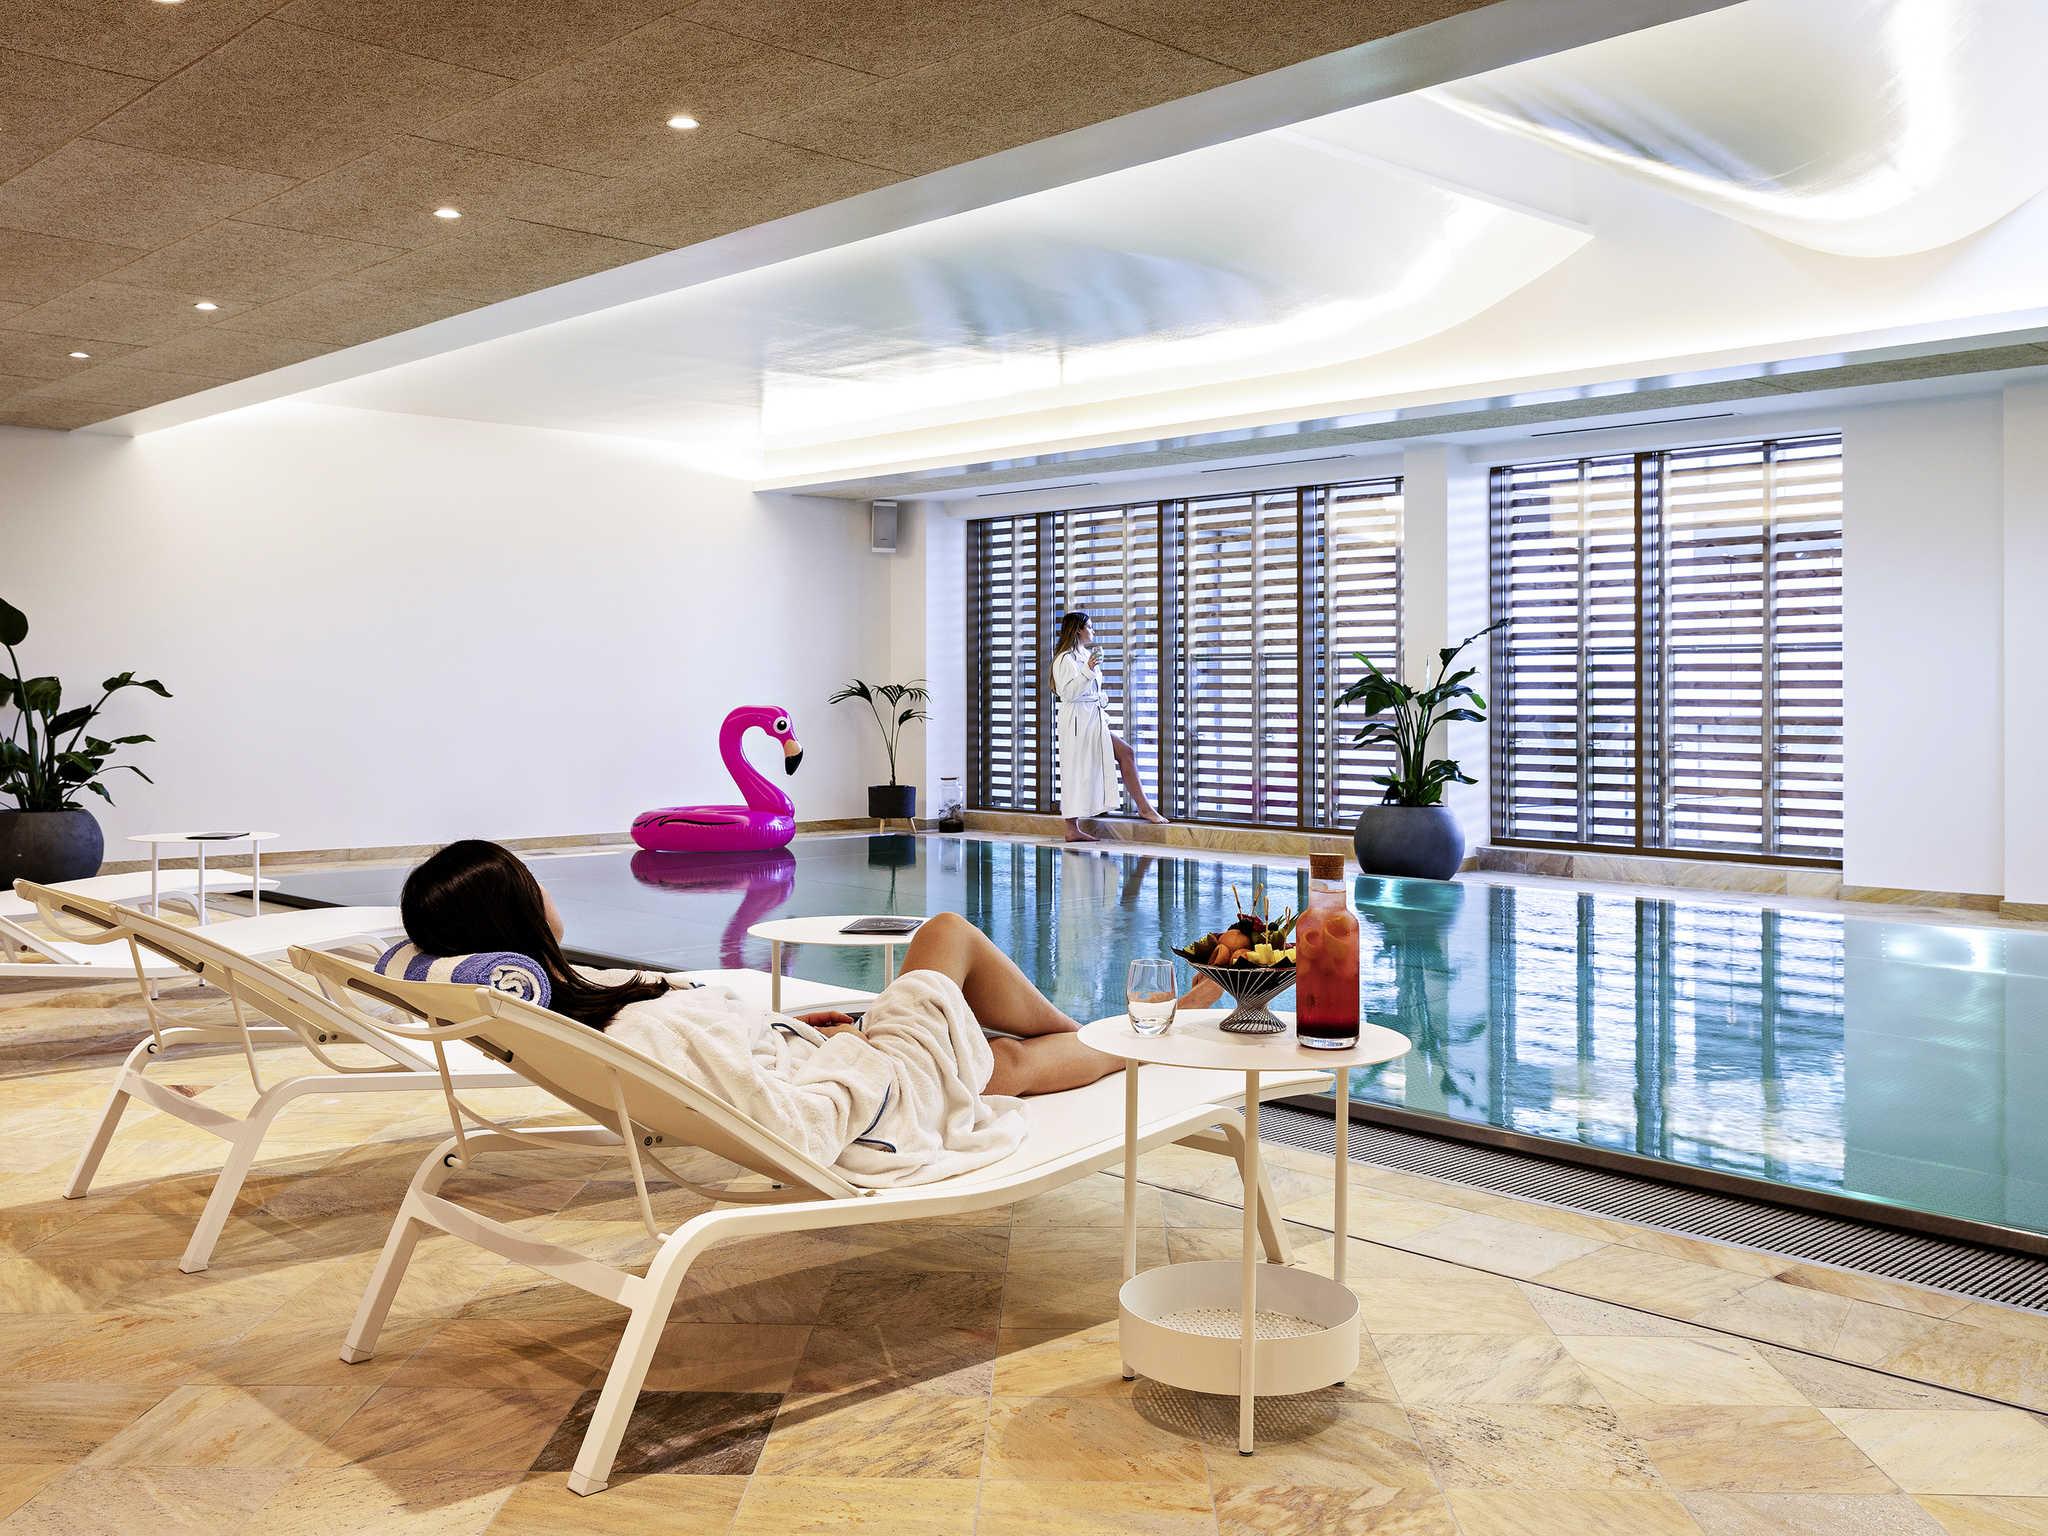 Hotell – Pullman Paris Centre - Bercy